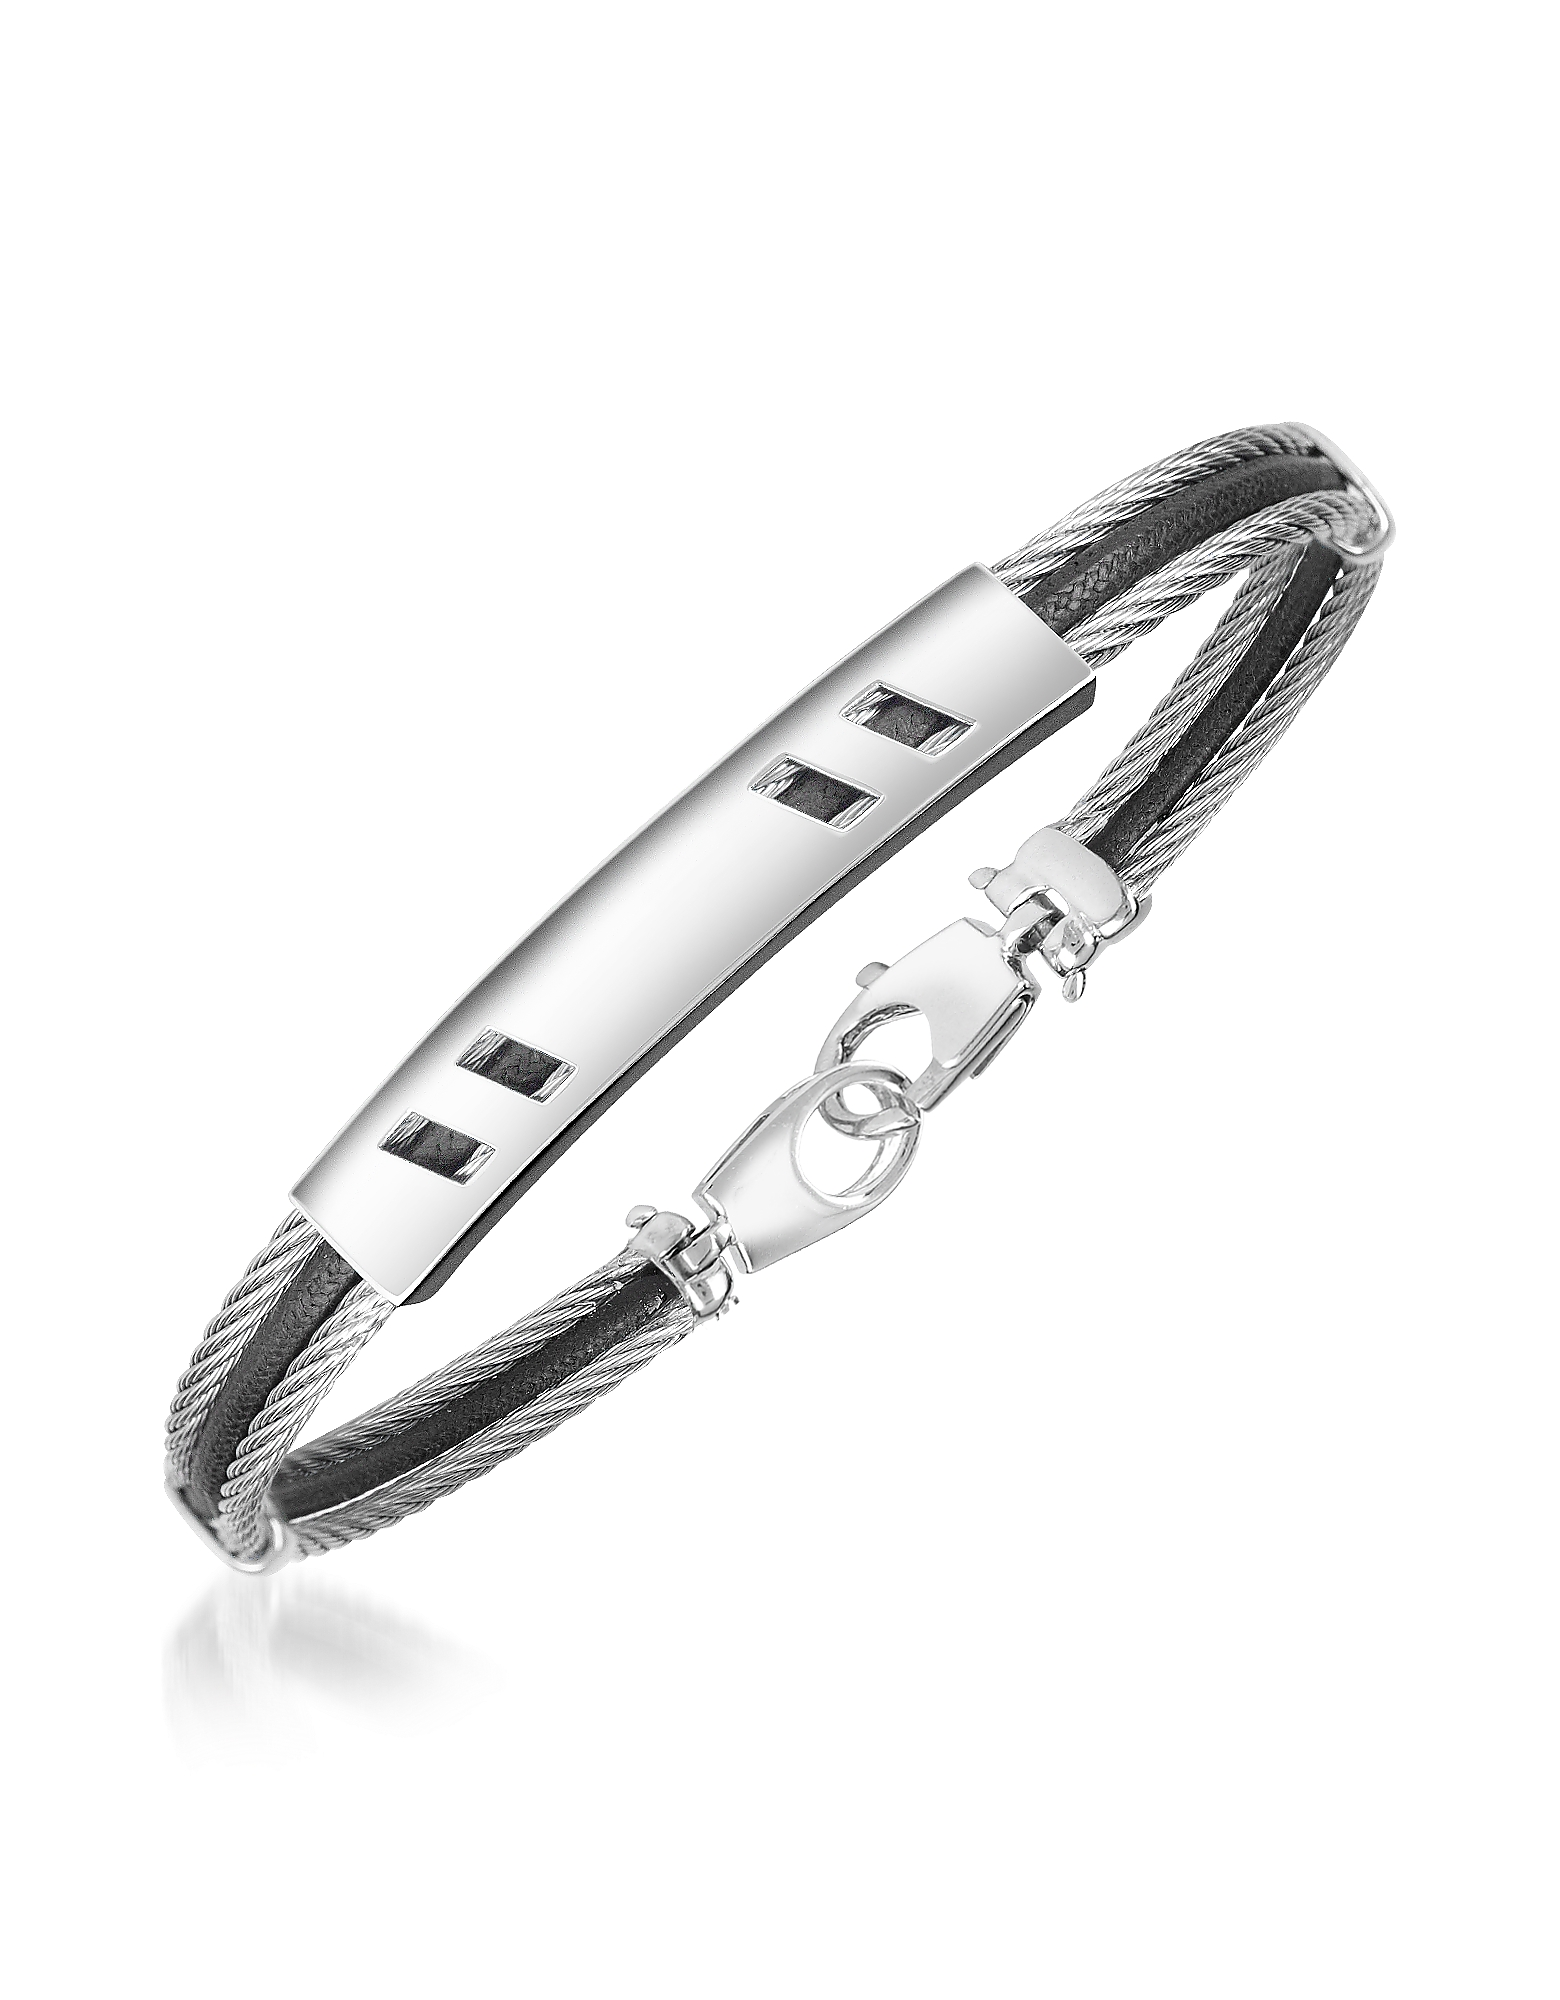 Forzieri Men's Bracelets, DiFulco Line Stainless Steel Bracelet